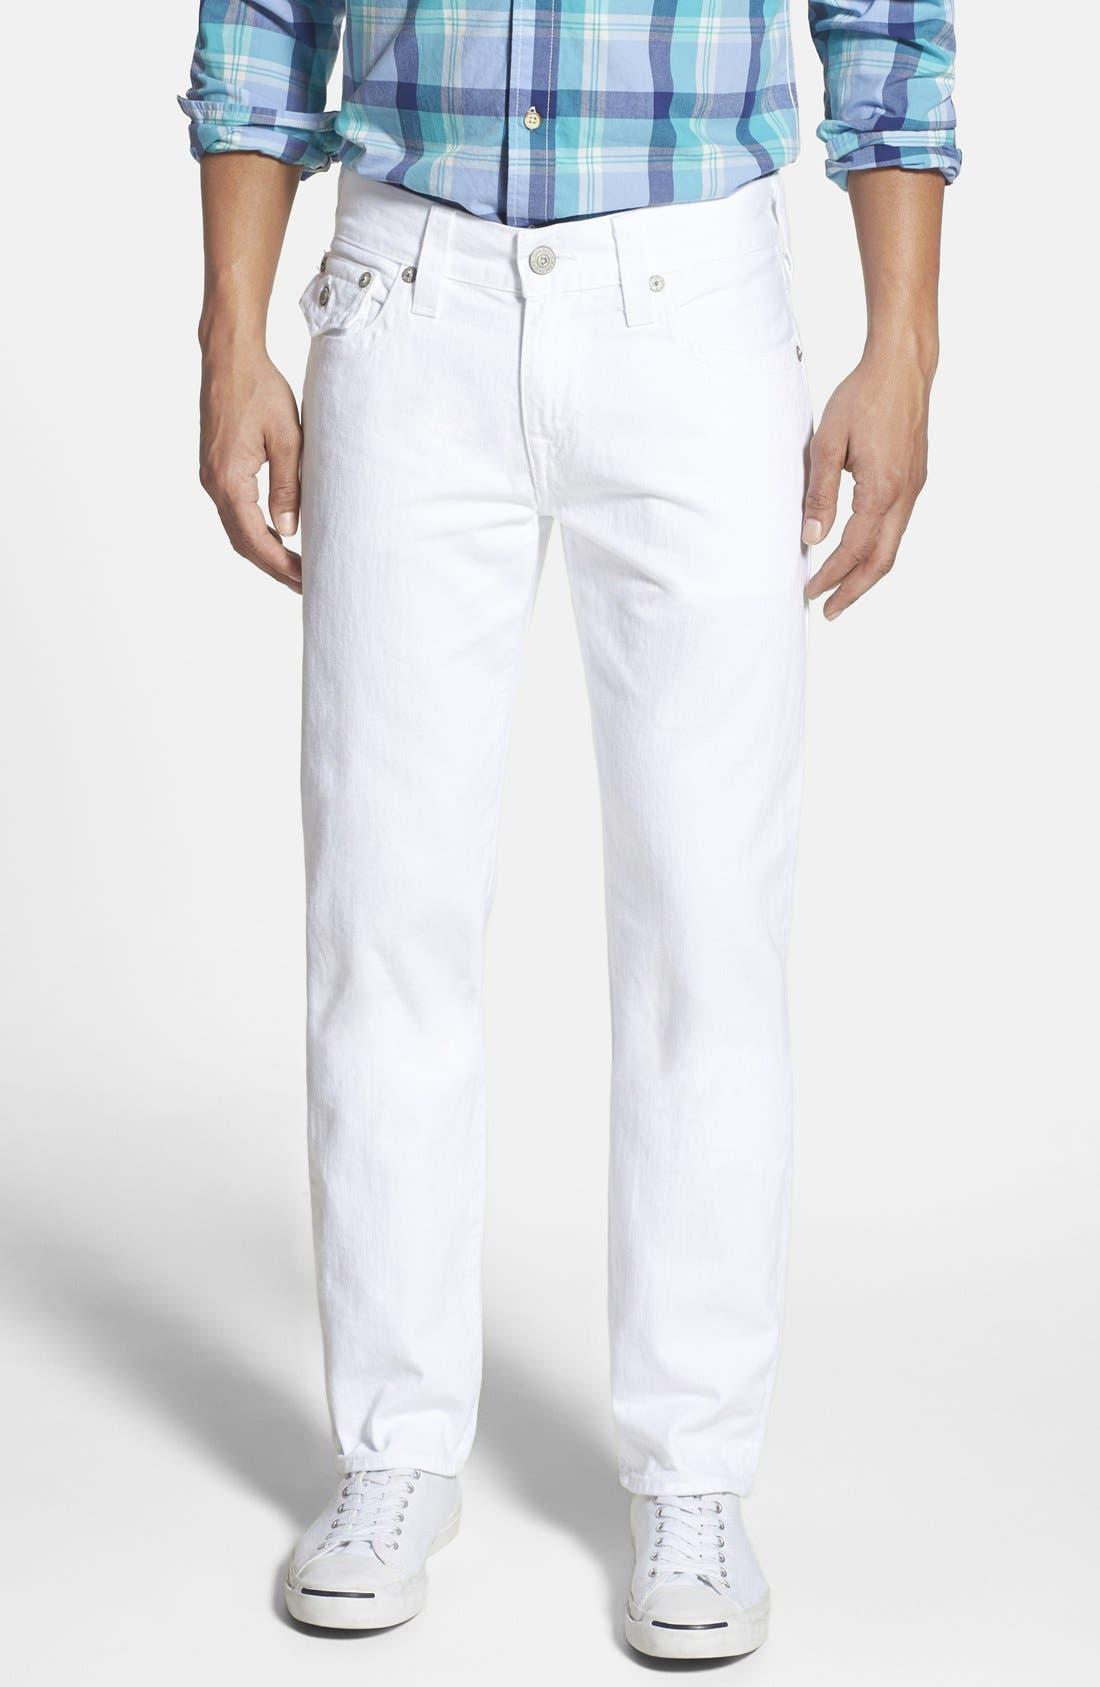 'Geno' Straight Leg Jeans,                             Main thumbnail 1, color,                             Optic White